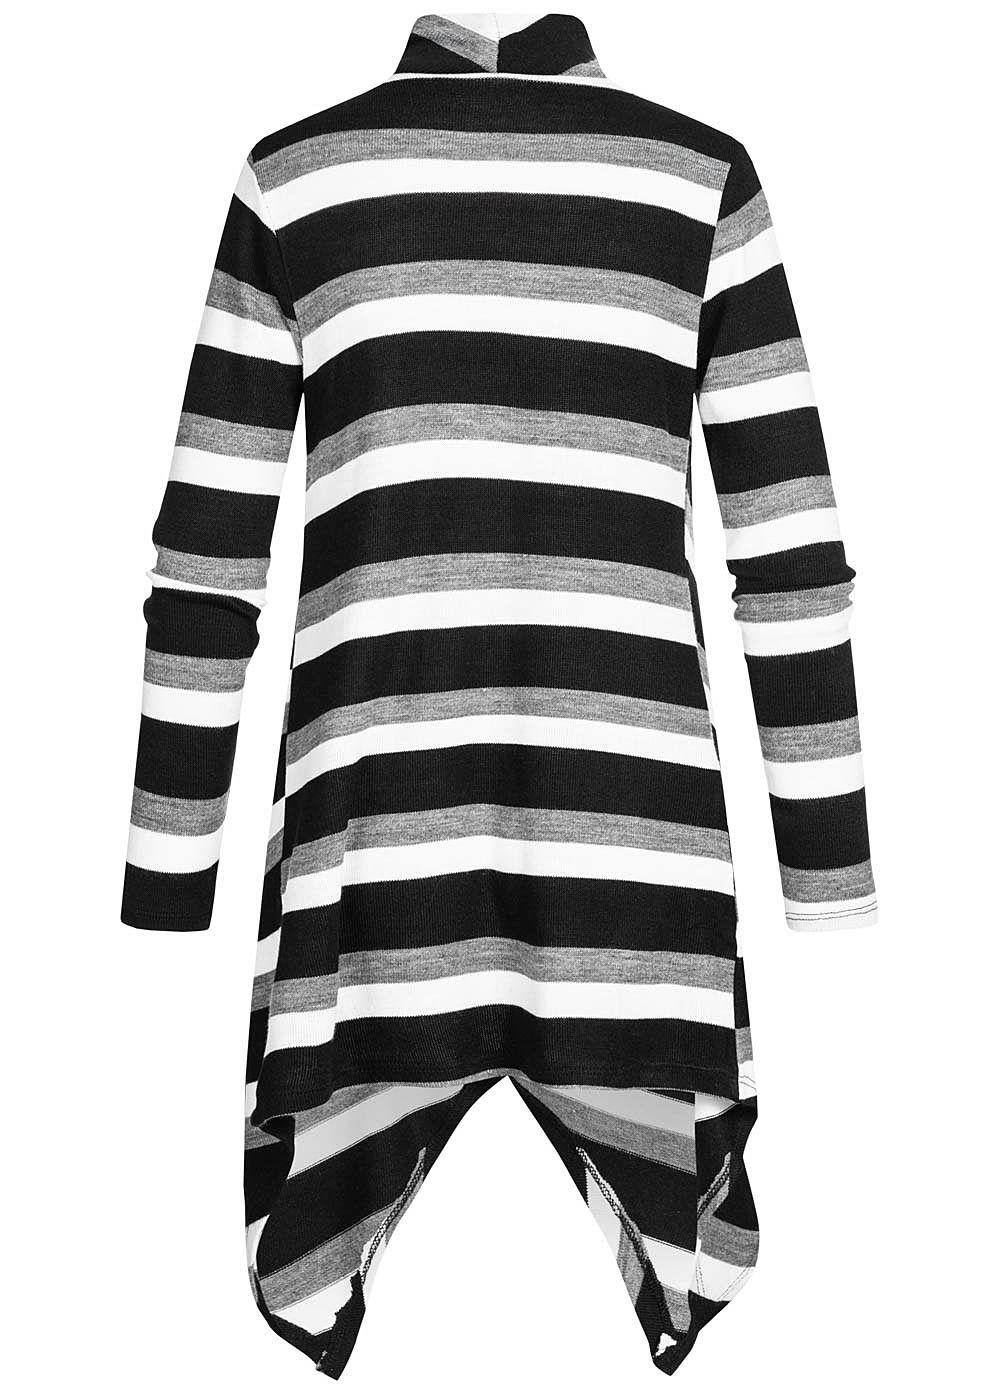 Styleboom Fashion Damen Draped Muster Cardigan Streifen schwarz weiss grau